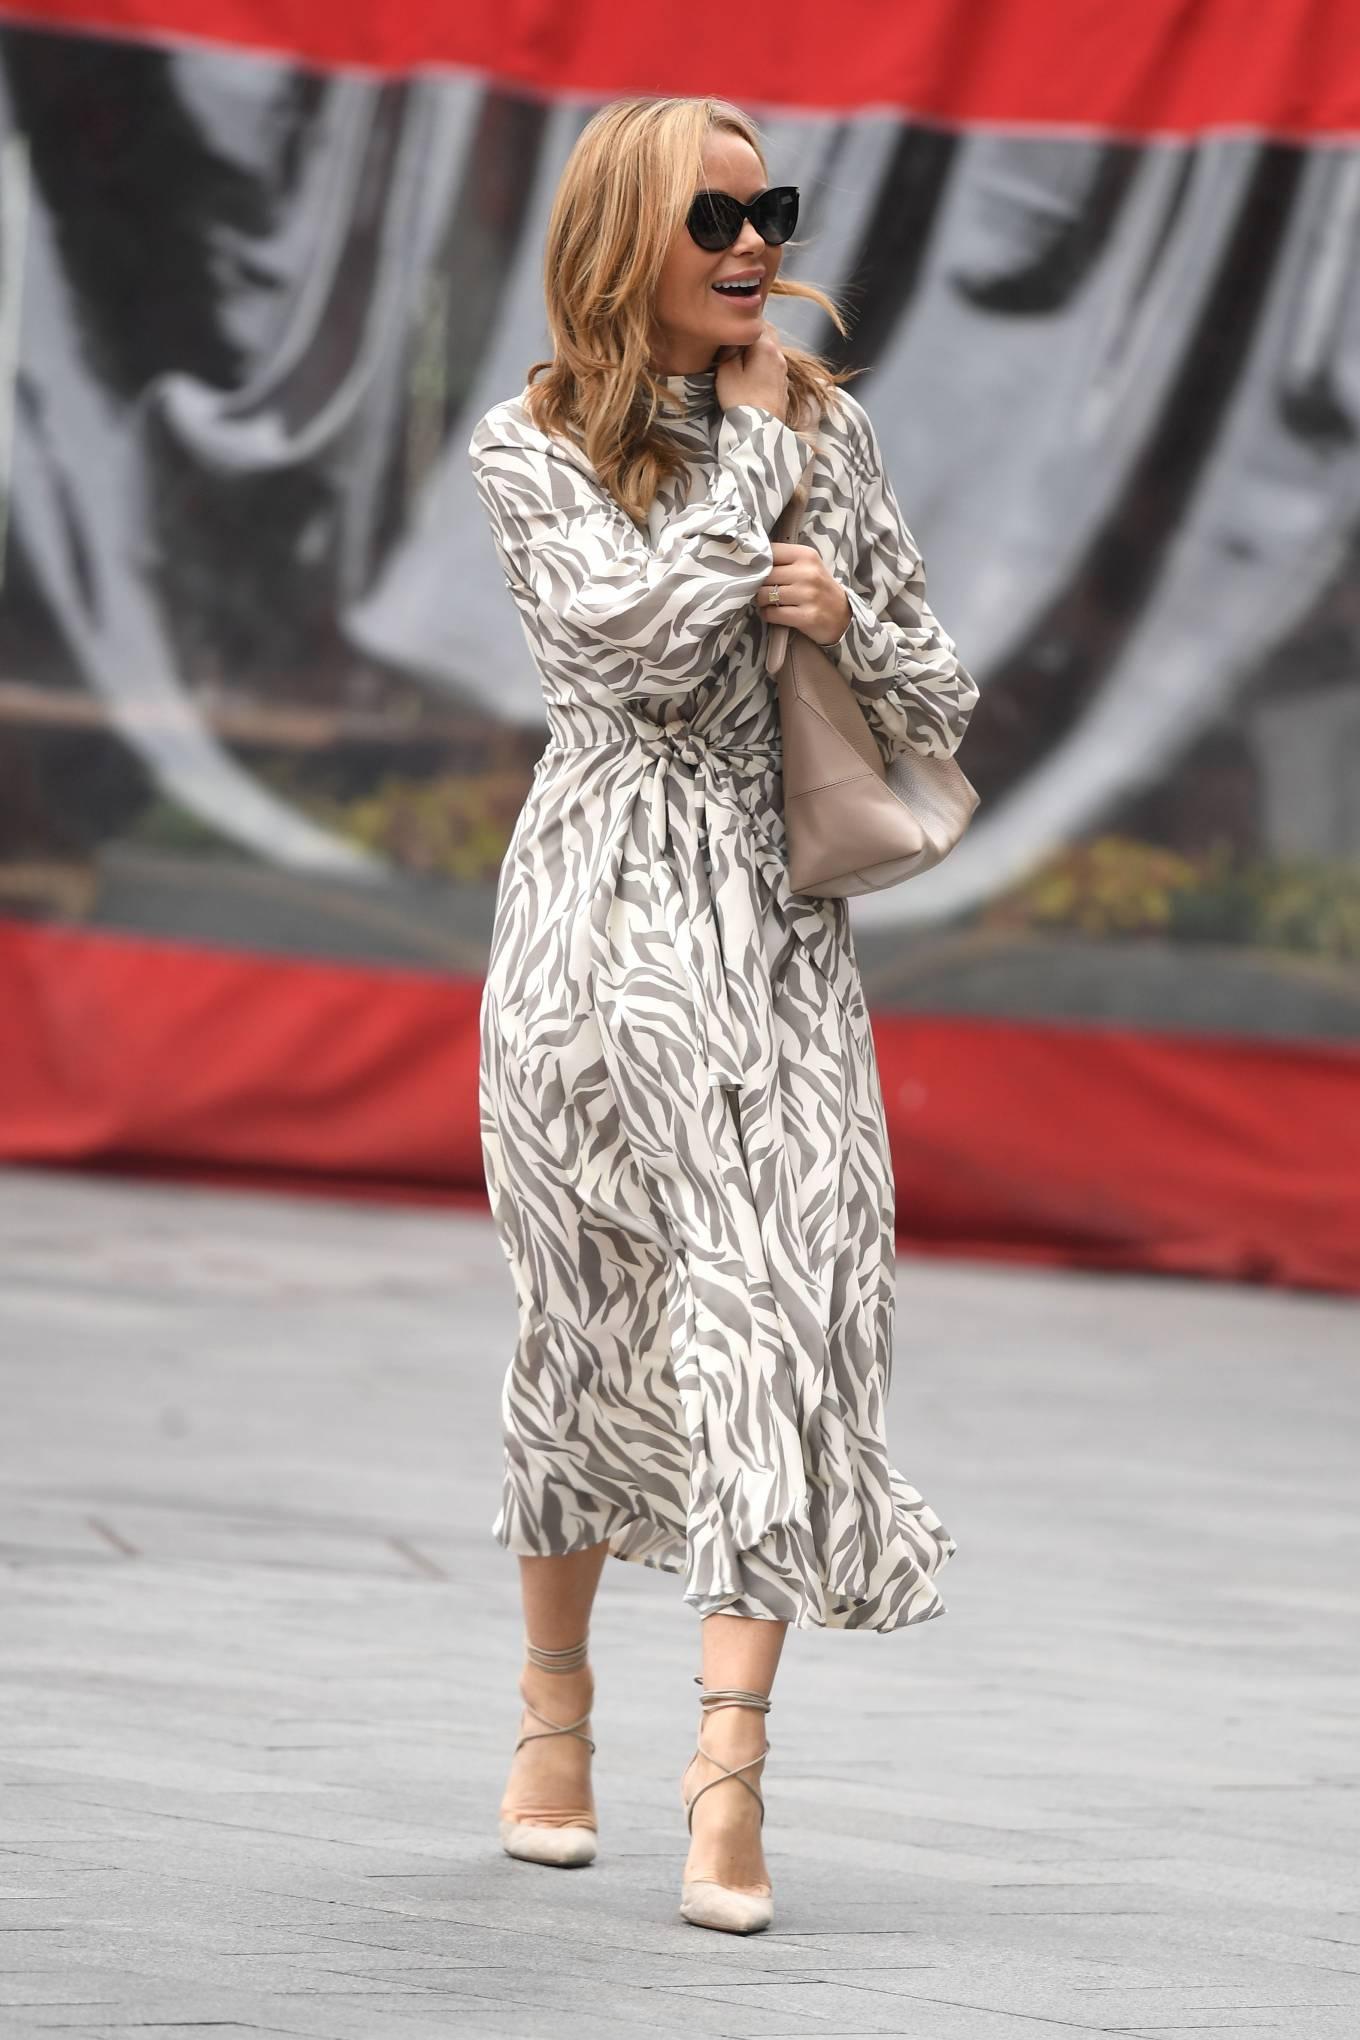 Amanda Holden 2021 : Amanda Holden – Wears monochrome dress at Heart radio in London-07